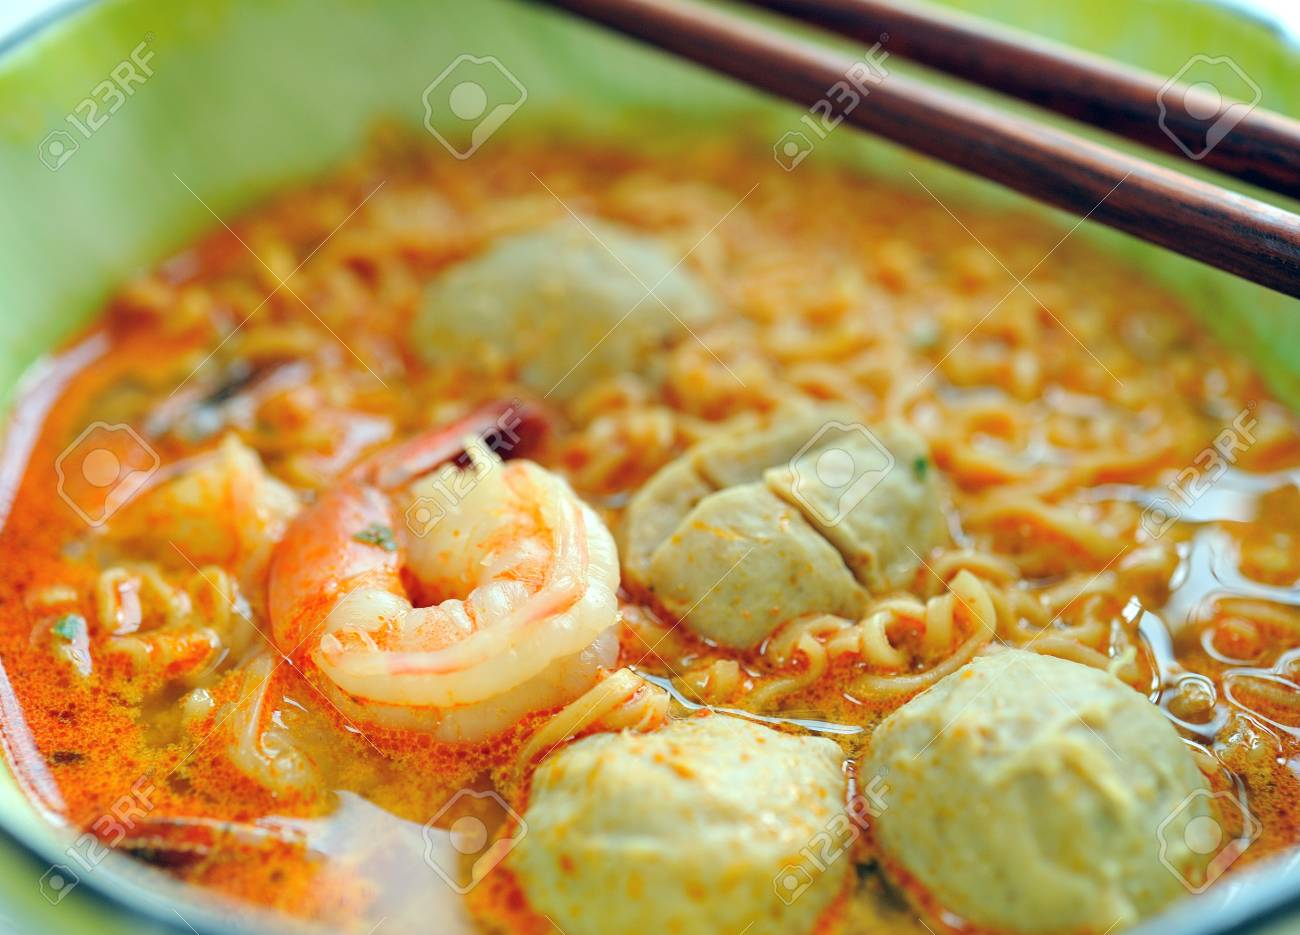 prawn mee, prawn noodles Stock Photo - 12349997